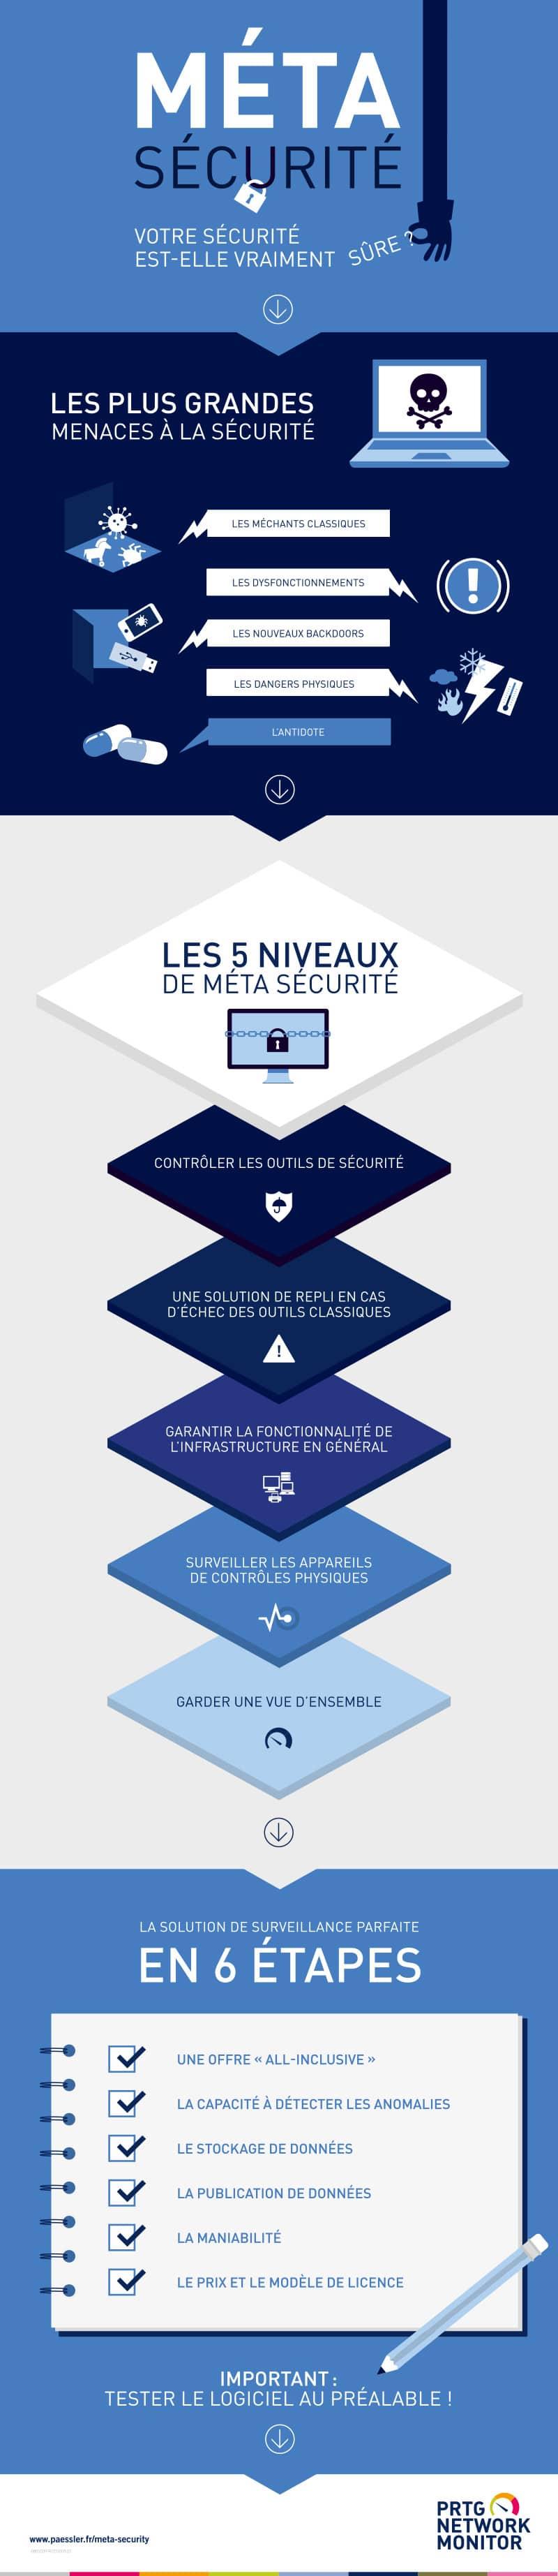 Infographie meta sécurité FINAL